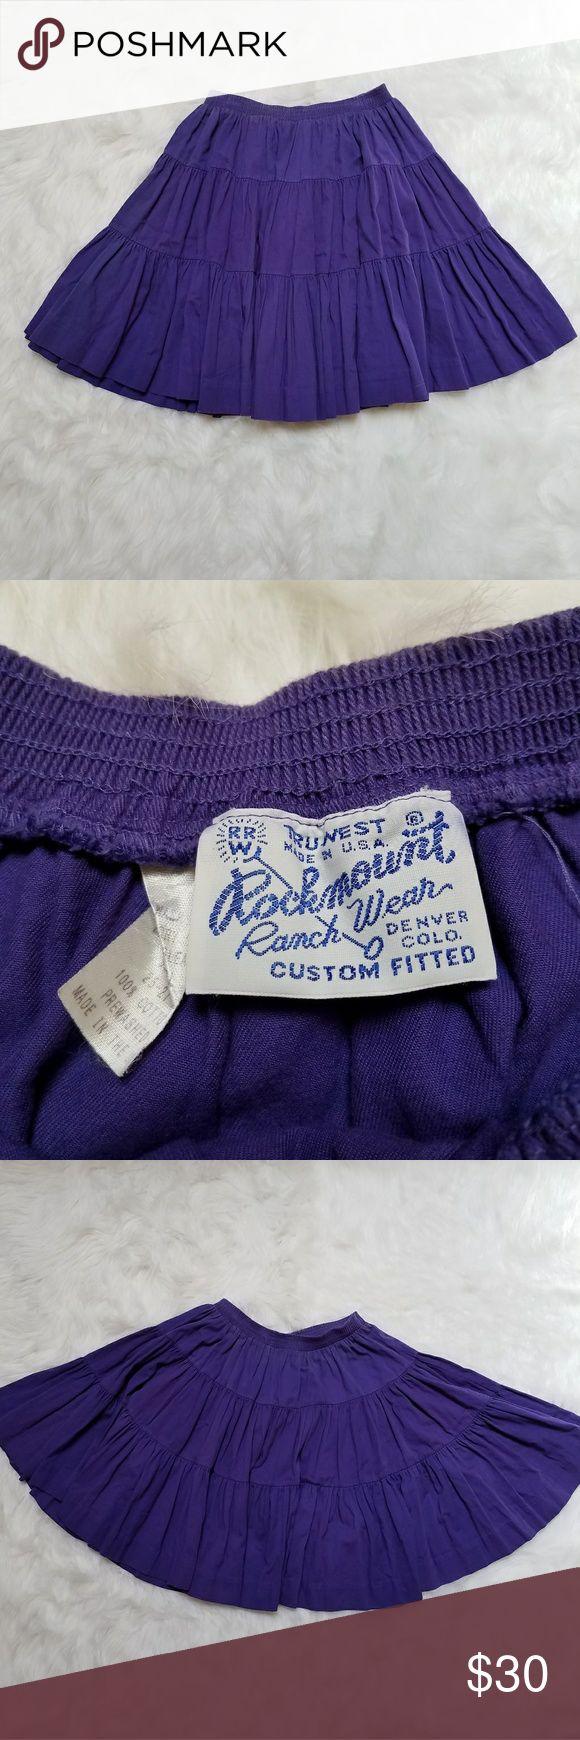 Vintage Rockmount Ranch wear skirt Vintage Rockmount Ranch wear purple rodeo skirt, waist measures 24, elastic waistband, lined, full skirt, made in Denver, CO USA, women's or girl's, state fair county fair or farm style Rockmount Ranch wear Skirts